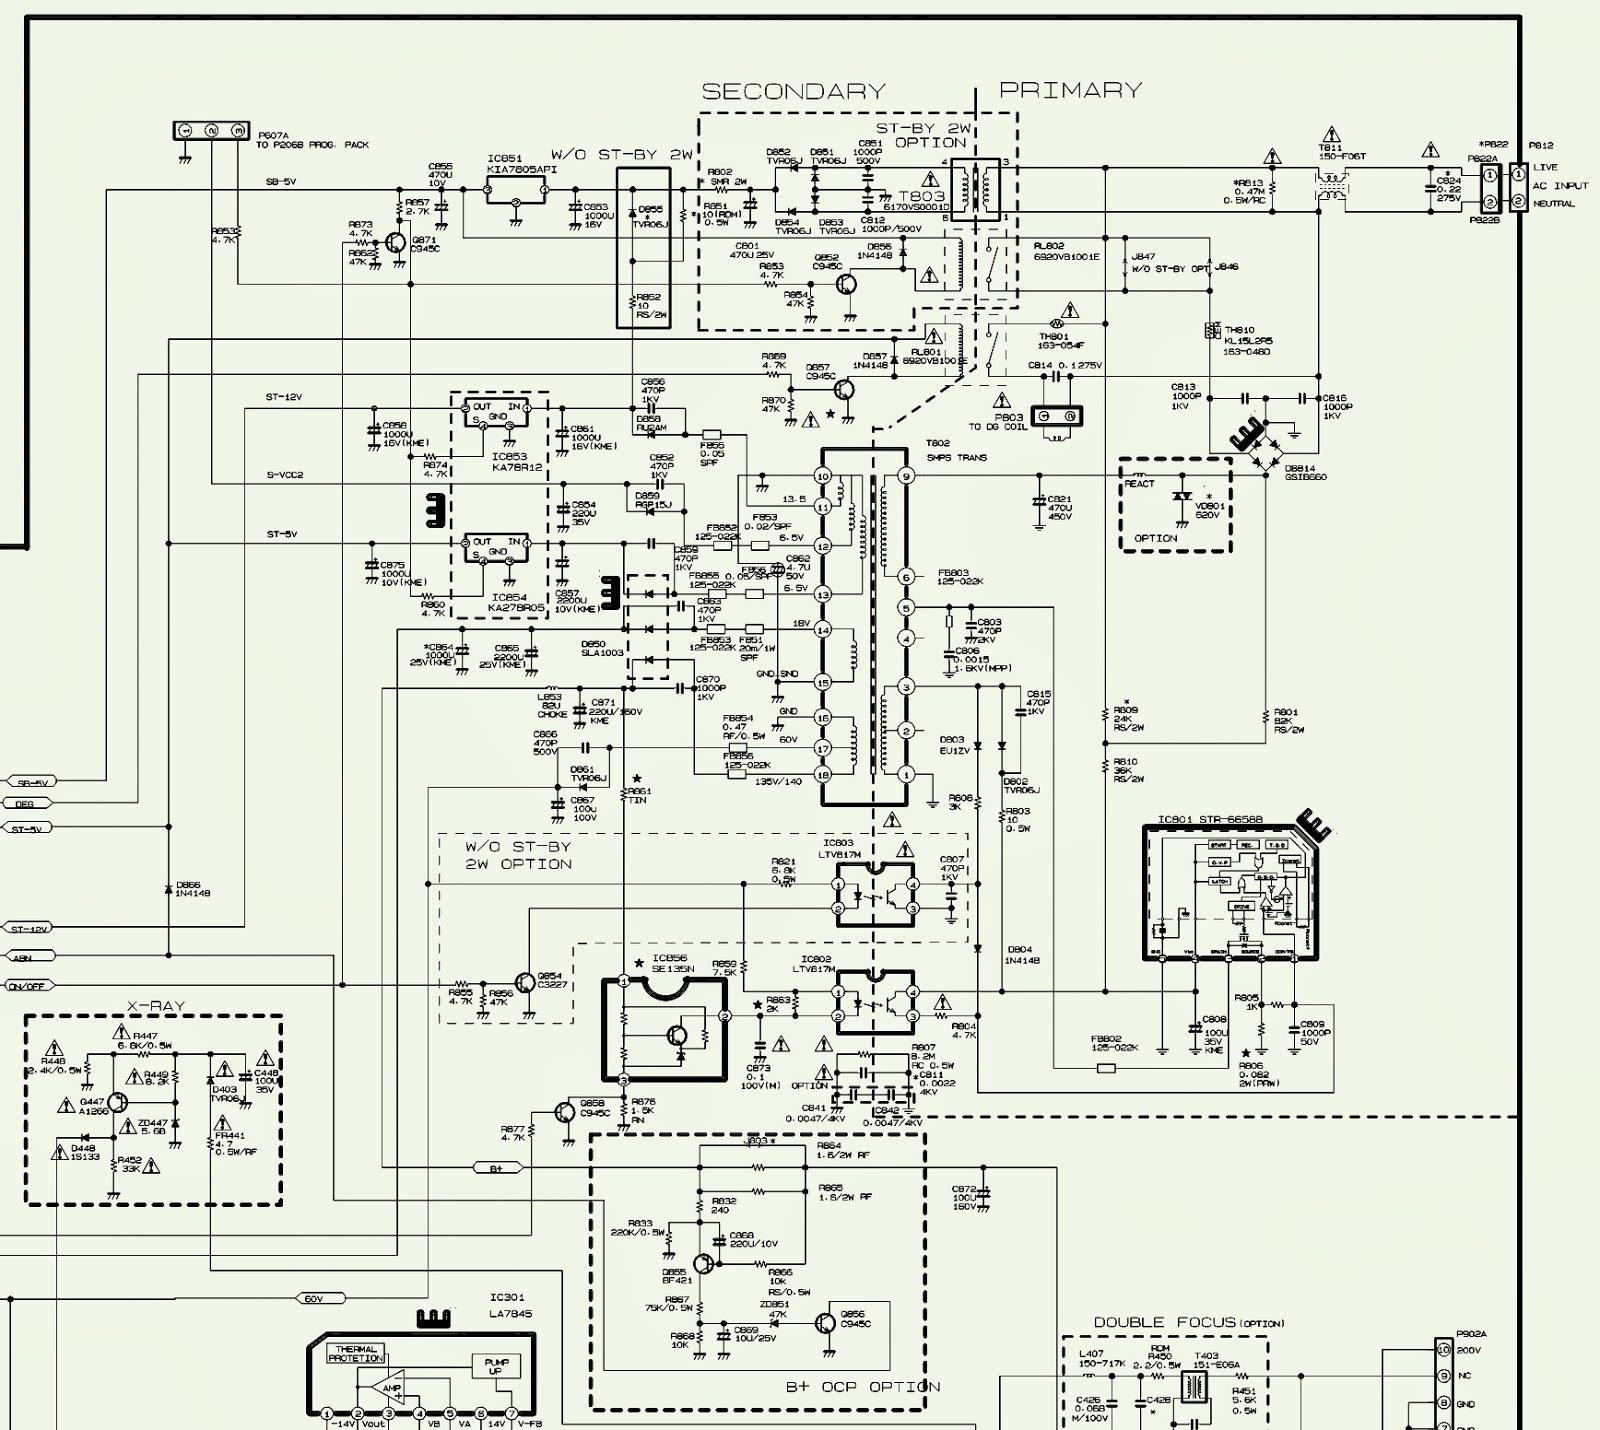 Toshiba Tv Wiring Diagram